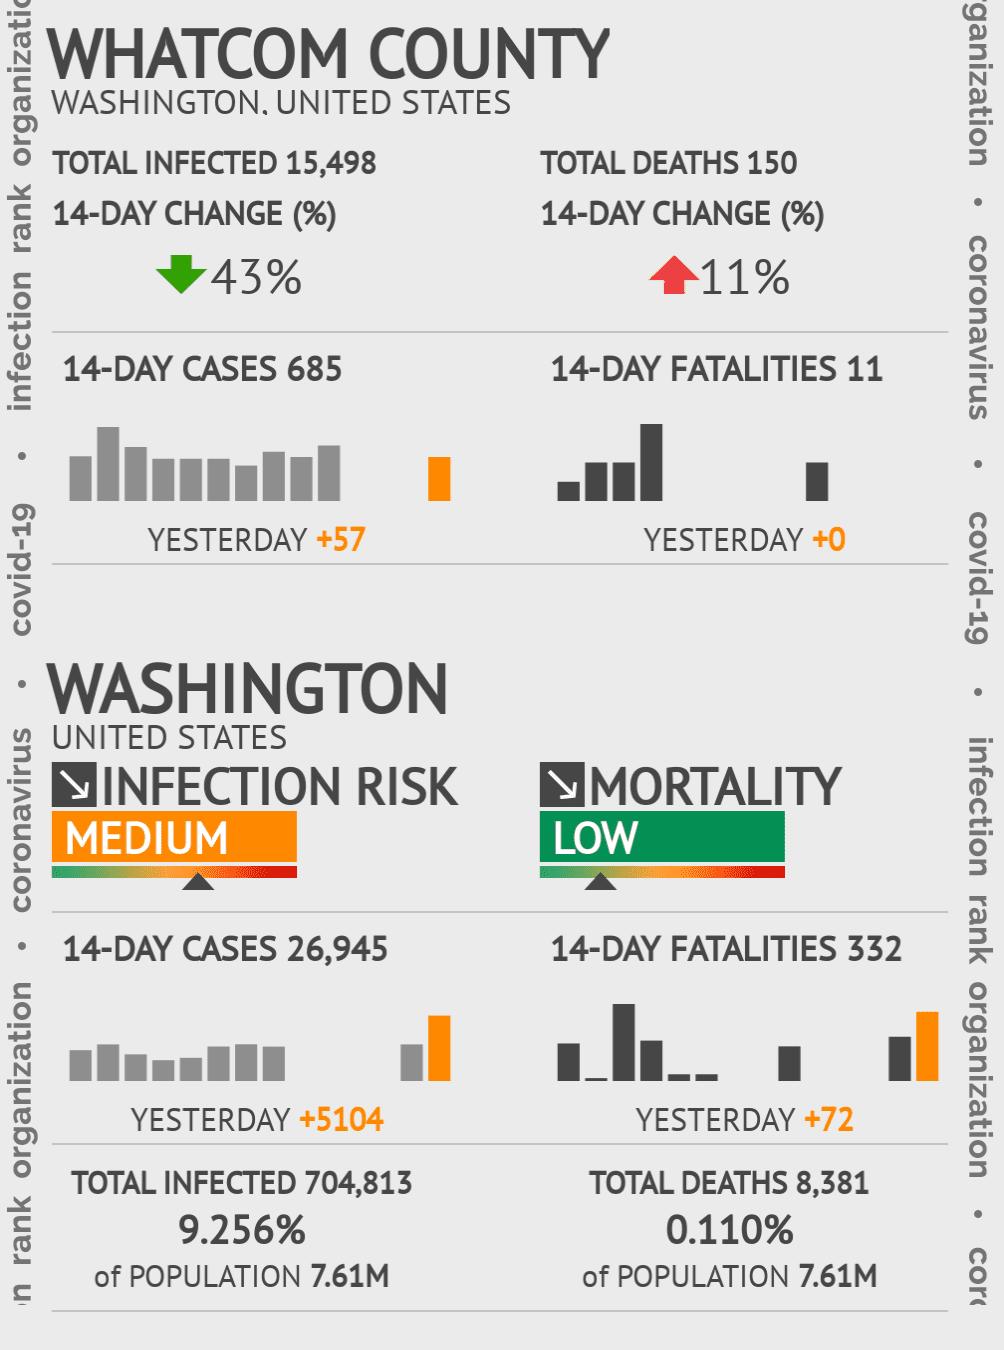 Whatcom County Coronavirus Covid-19 Risk of Infection on July 24, 2021